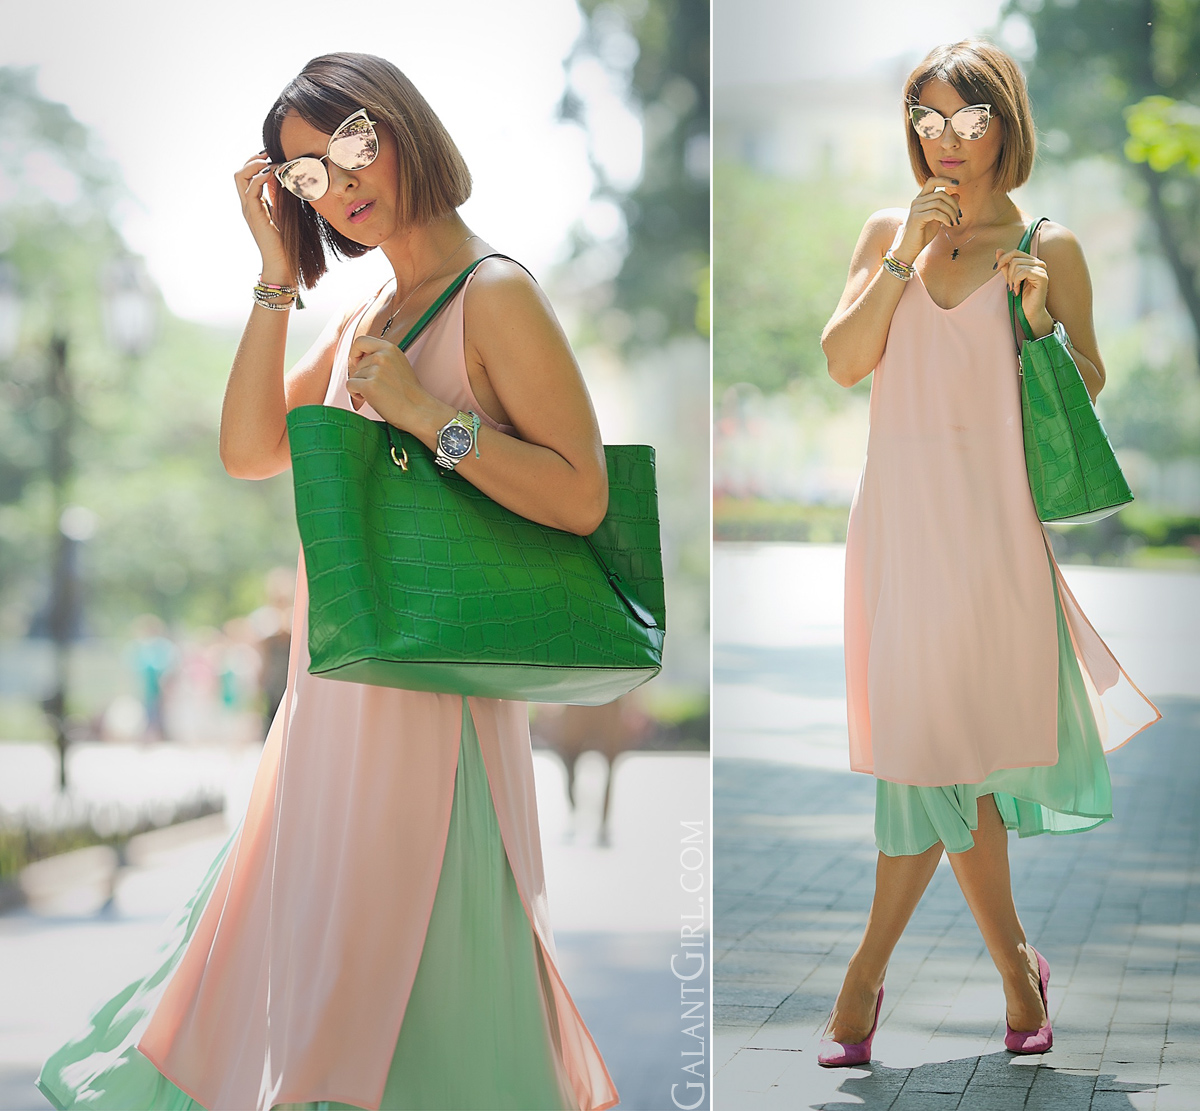 diana-von-furstenberg-bag-summer-chic-outfit-galant-girl